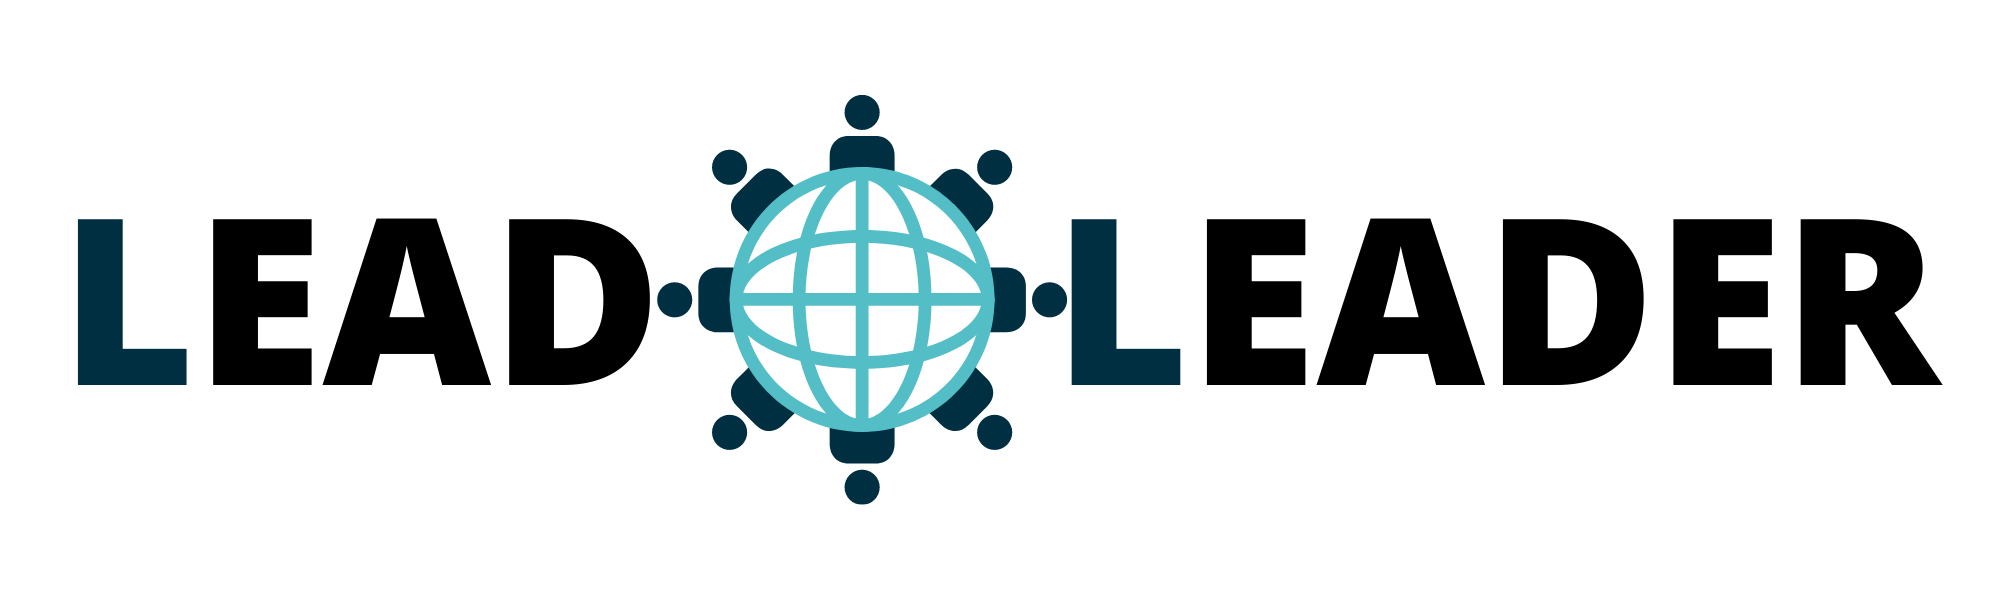 Lead Leader Logo